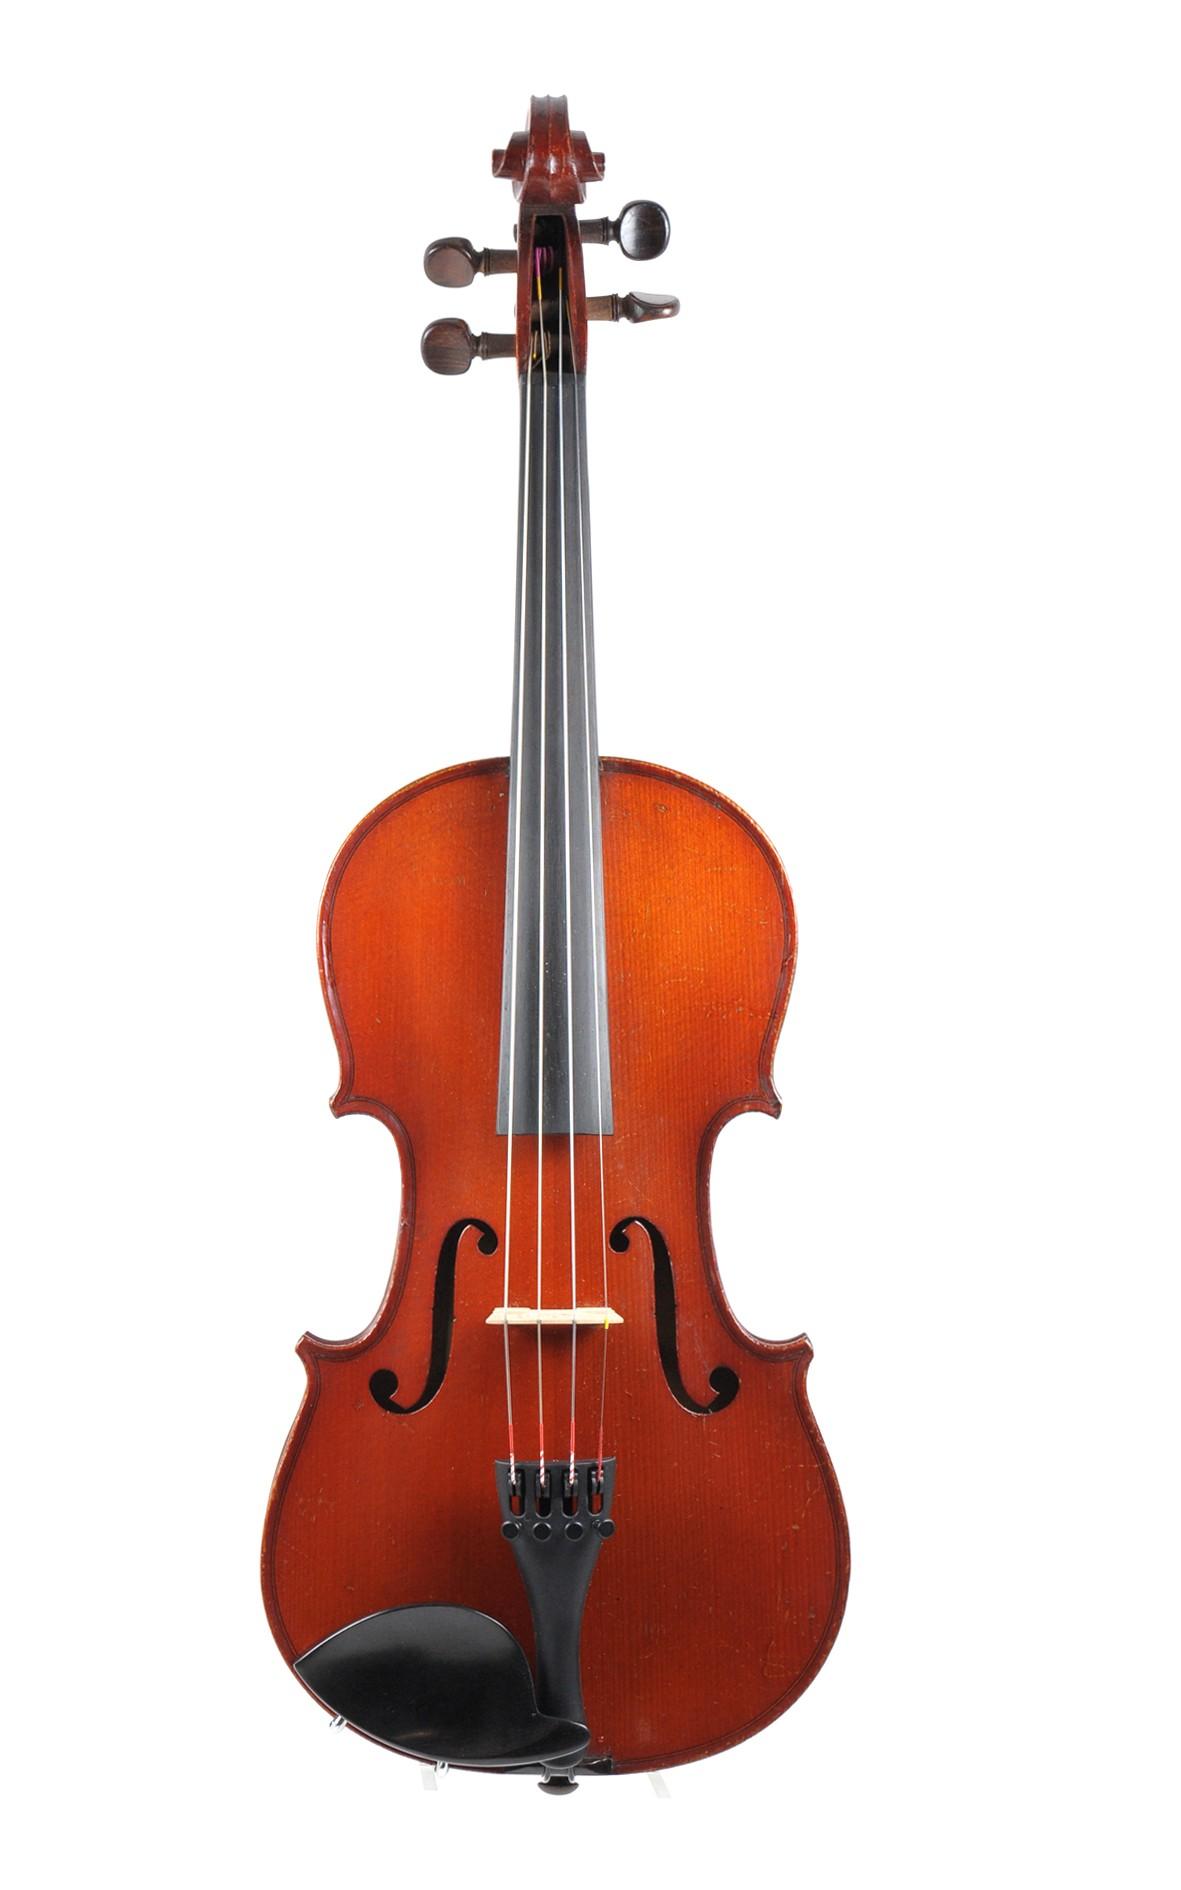 Carel 3/4 violin, Laberte-Humbert approx. 1920 - front view